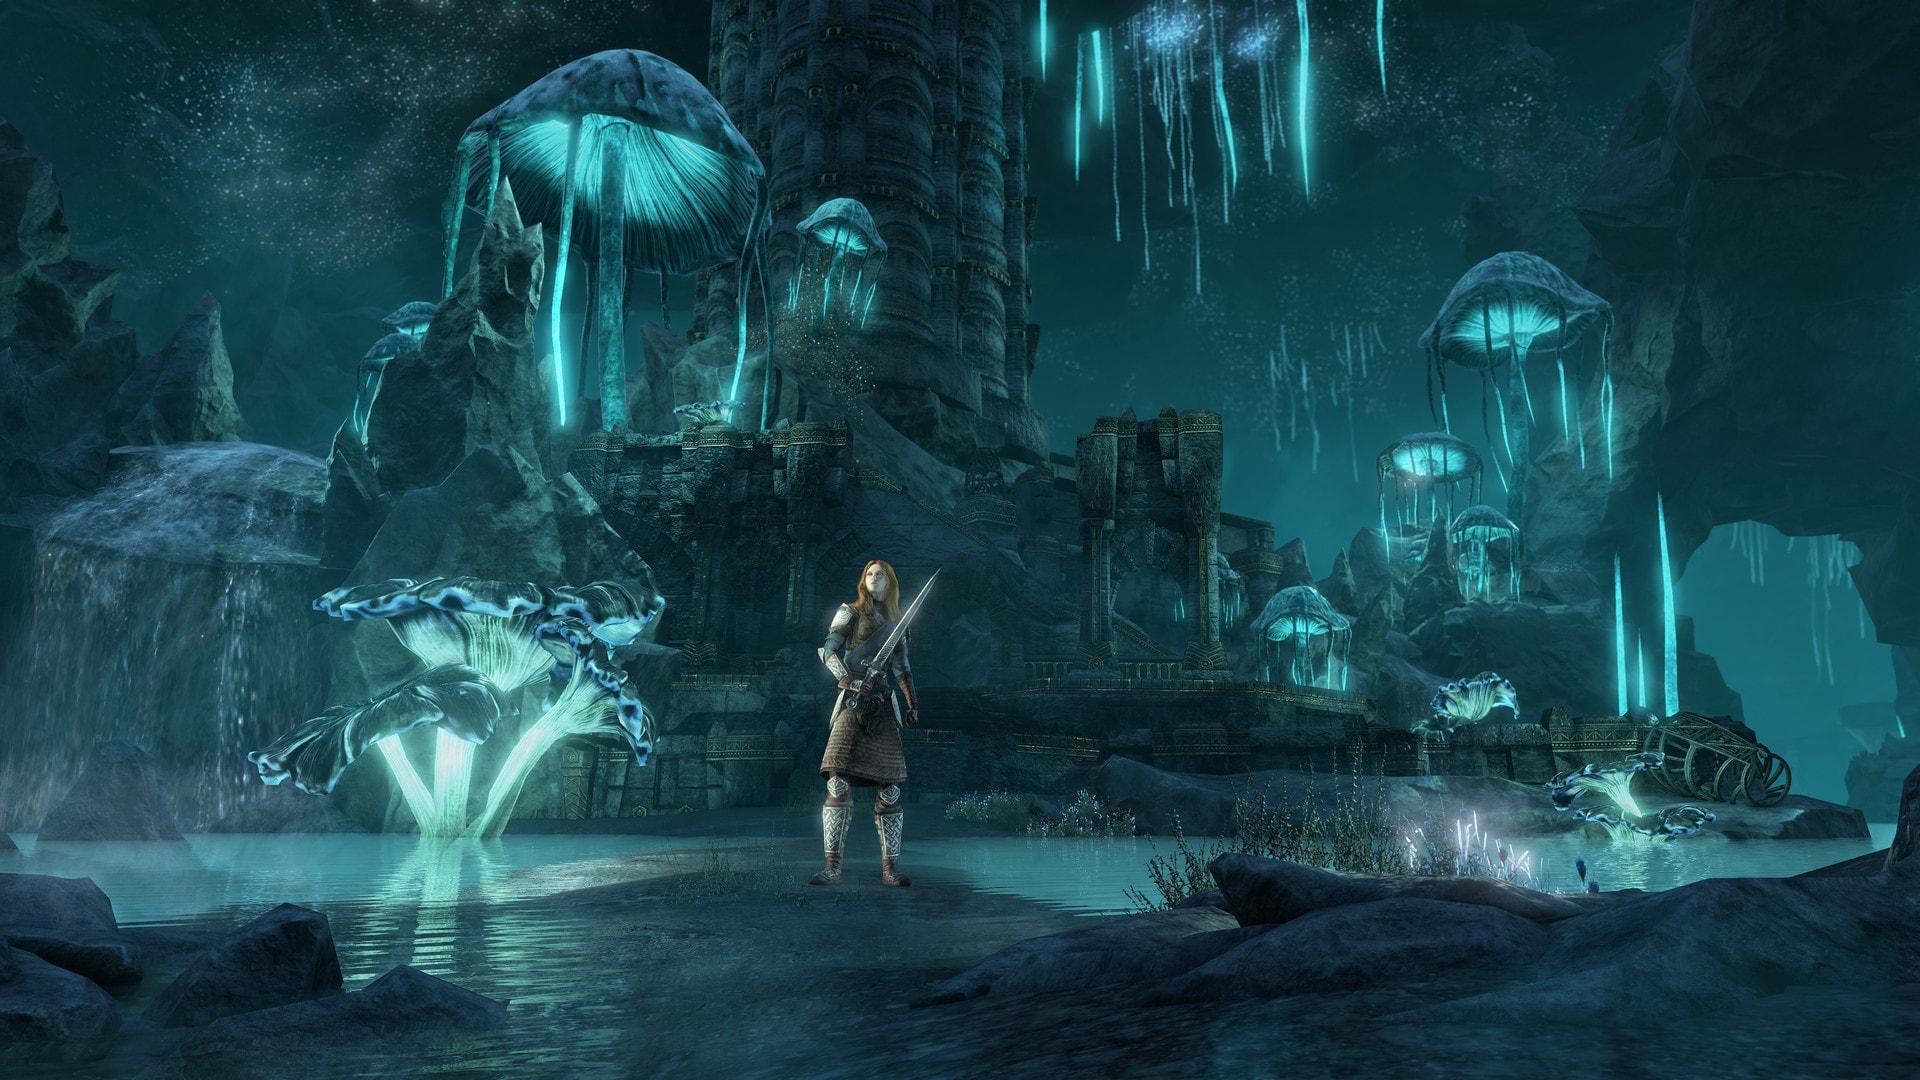 The Elder Scrolls Online - Greymoor Upgrade (PC) - TESO Key - GLOBAL - 3